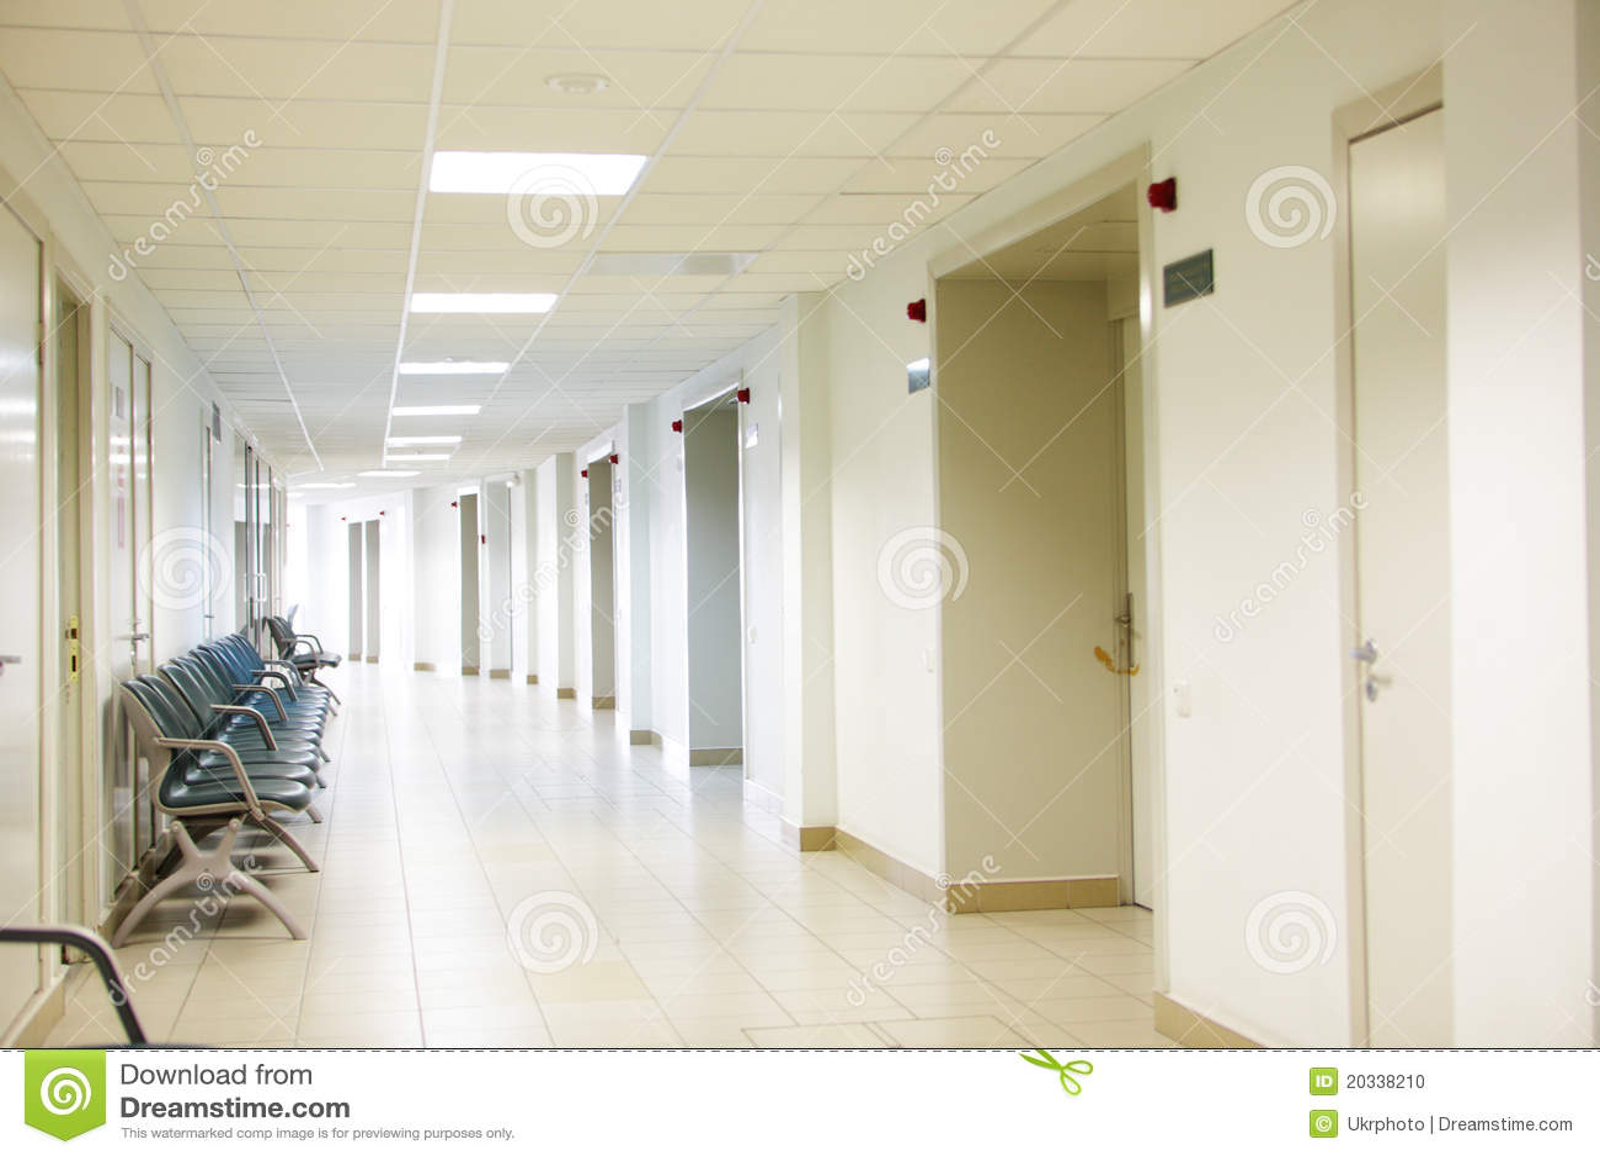 Hospital interior stock photo Image of hospital